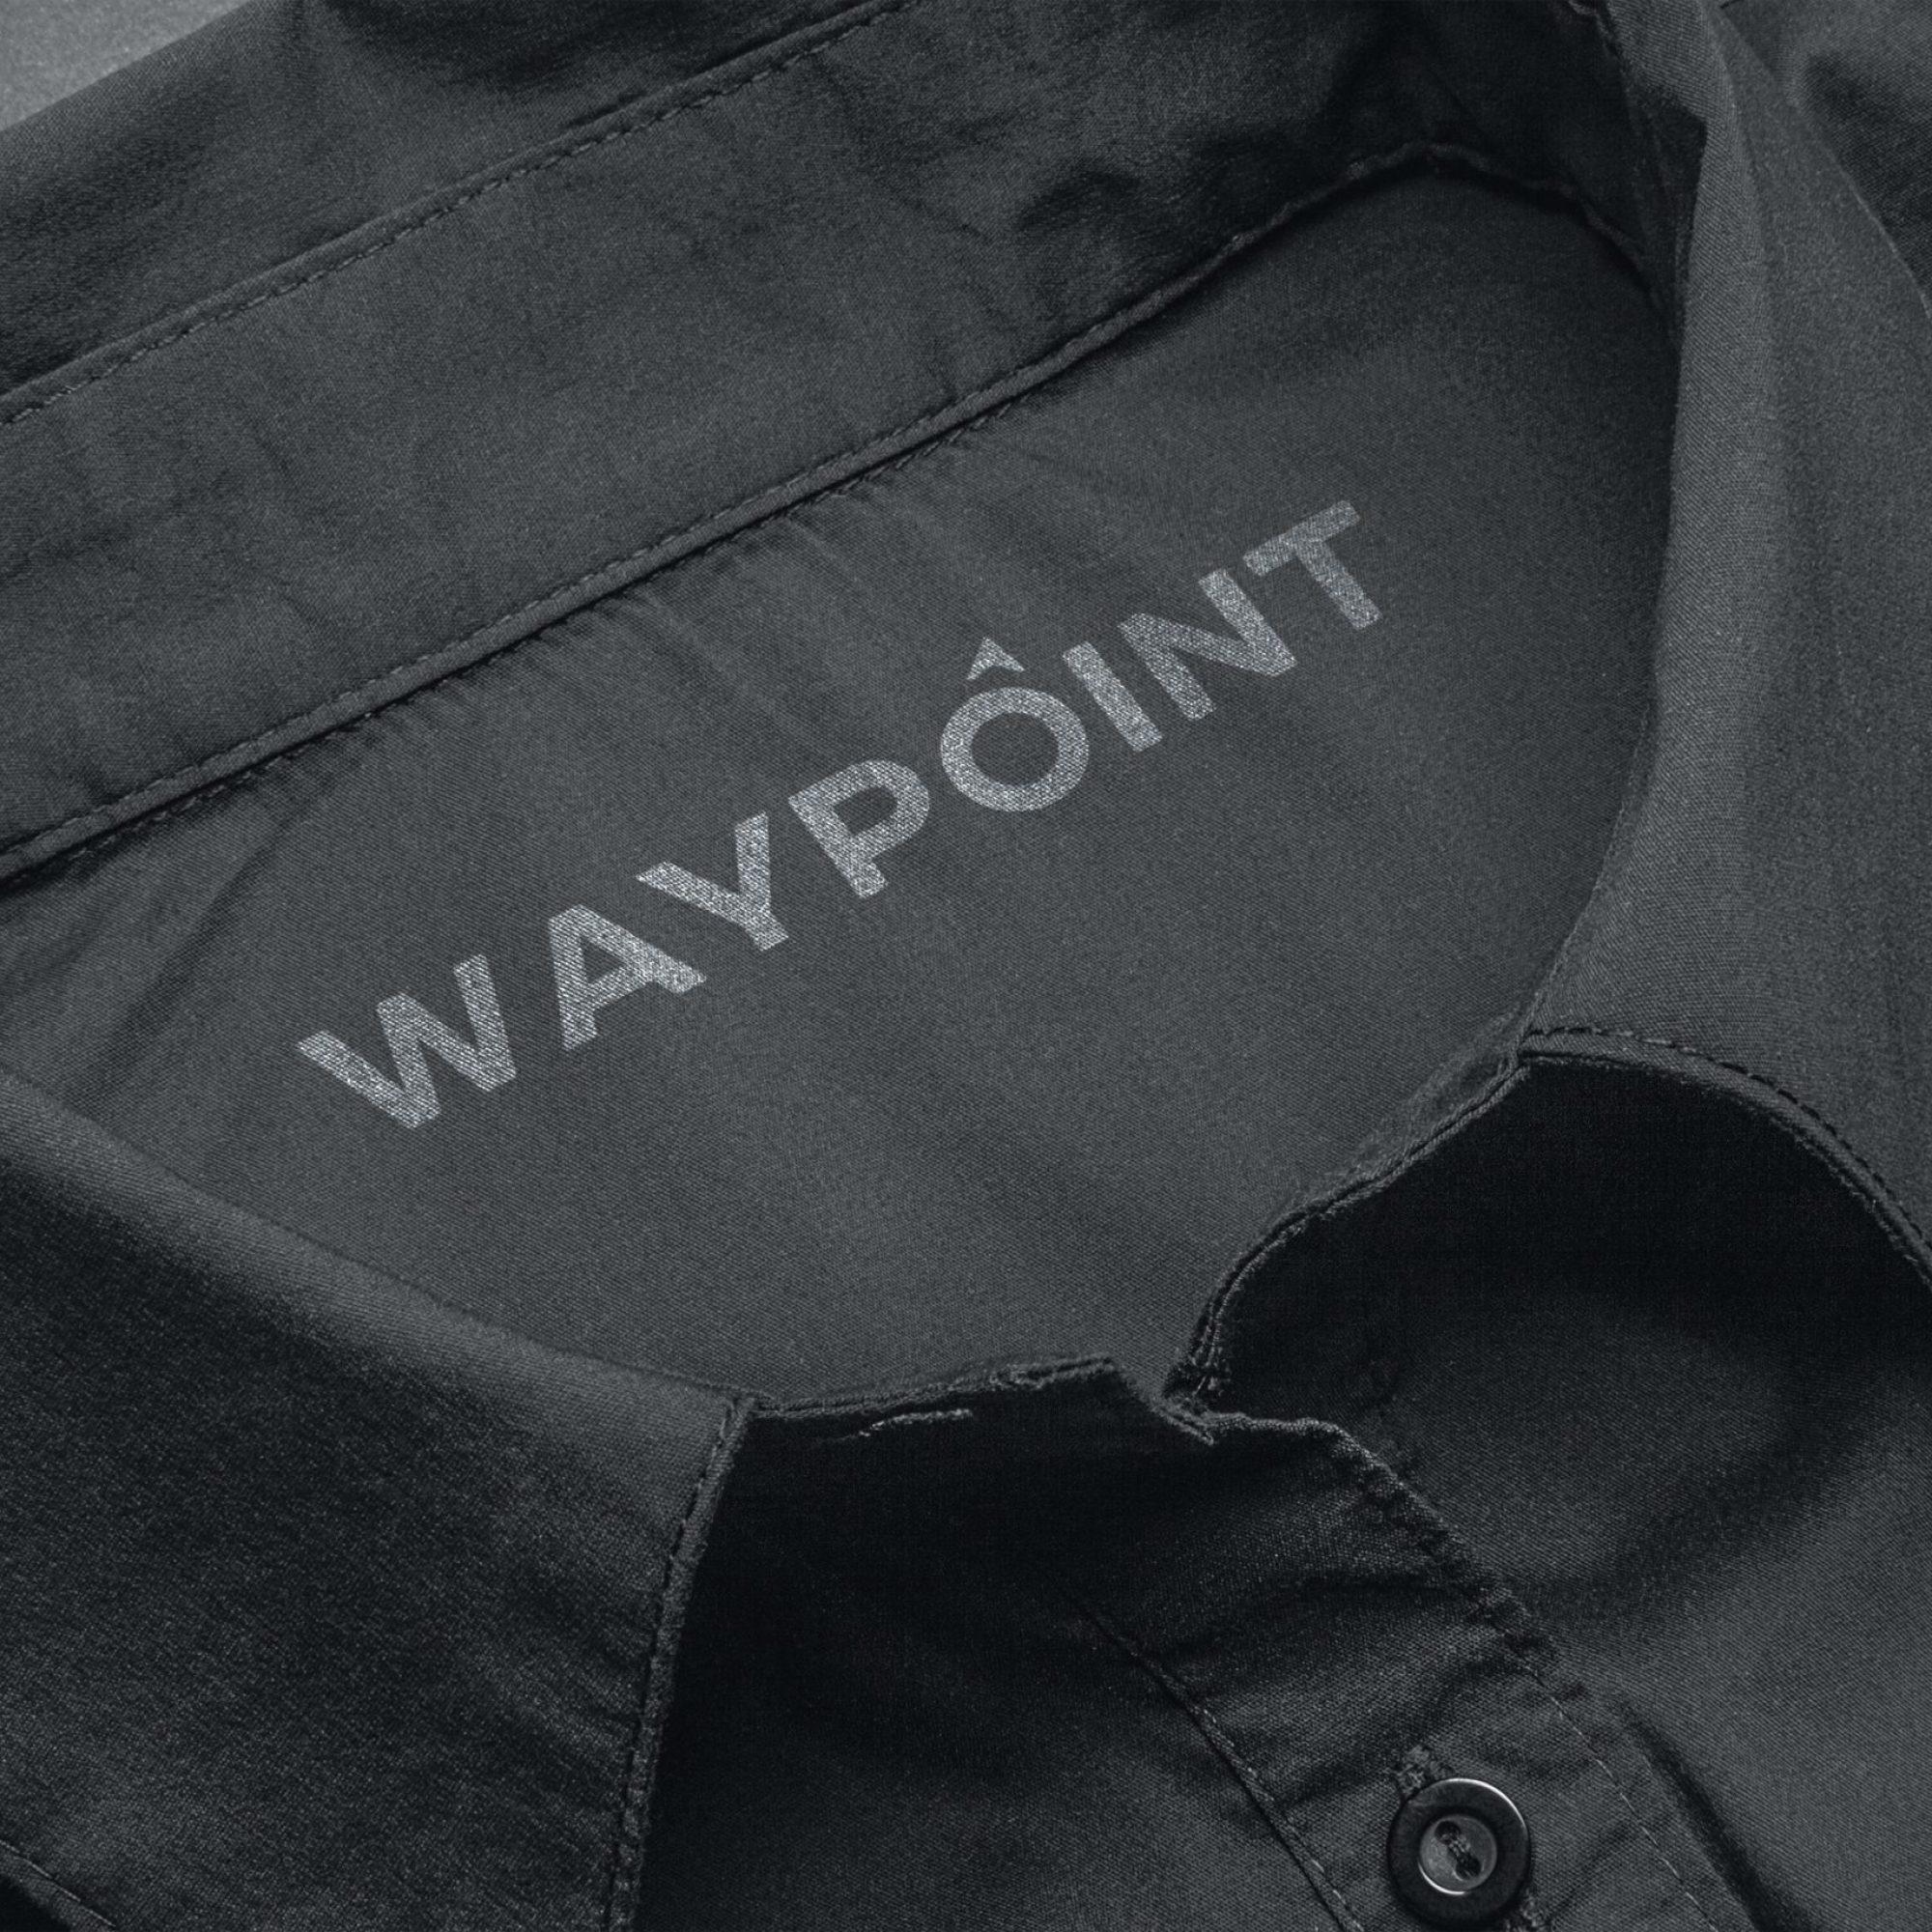 Waypoint_Shirt